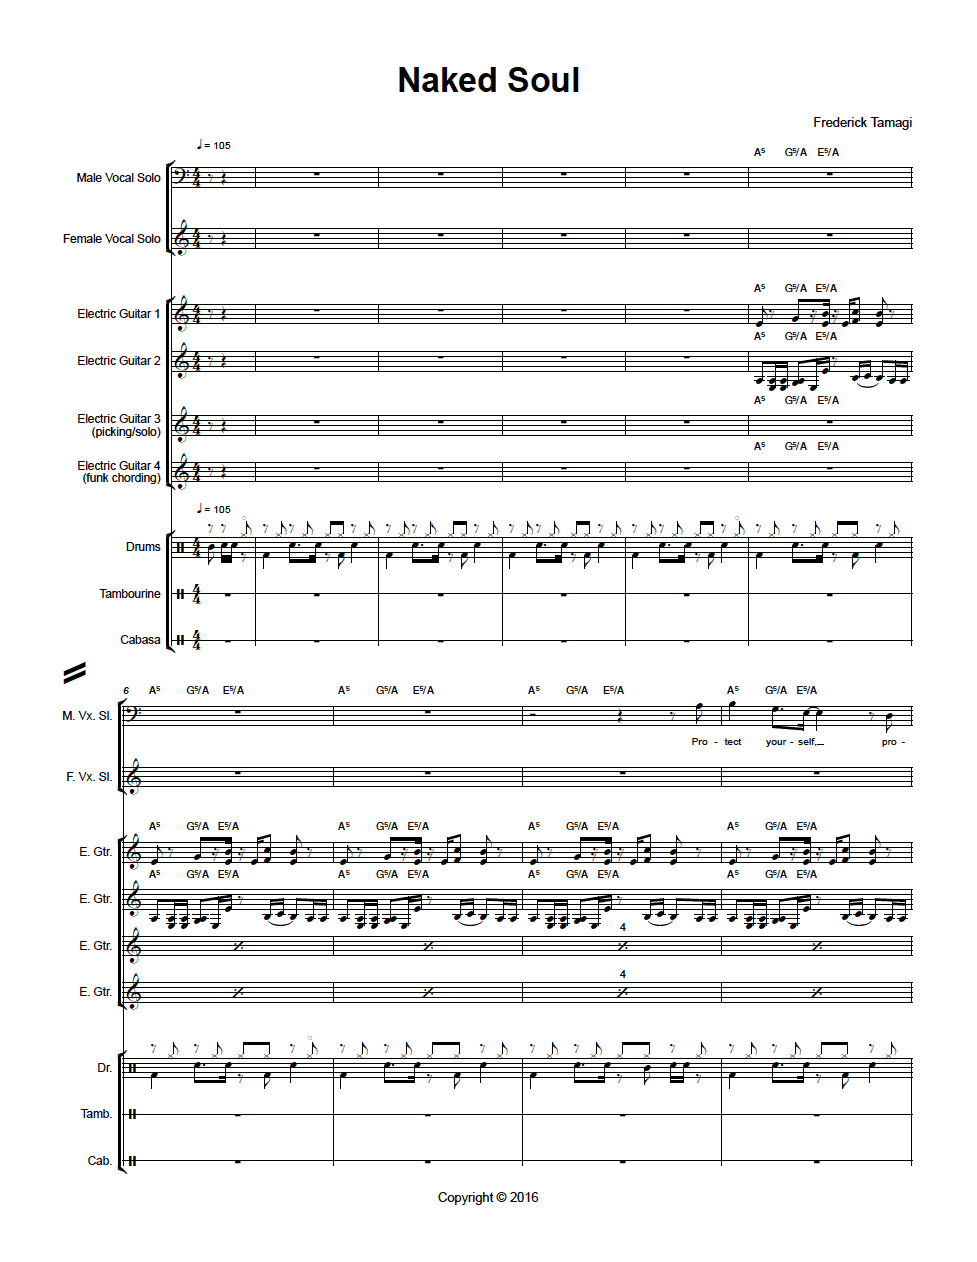 Music Transcription Service